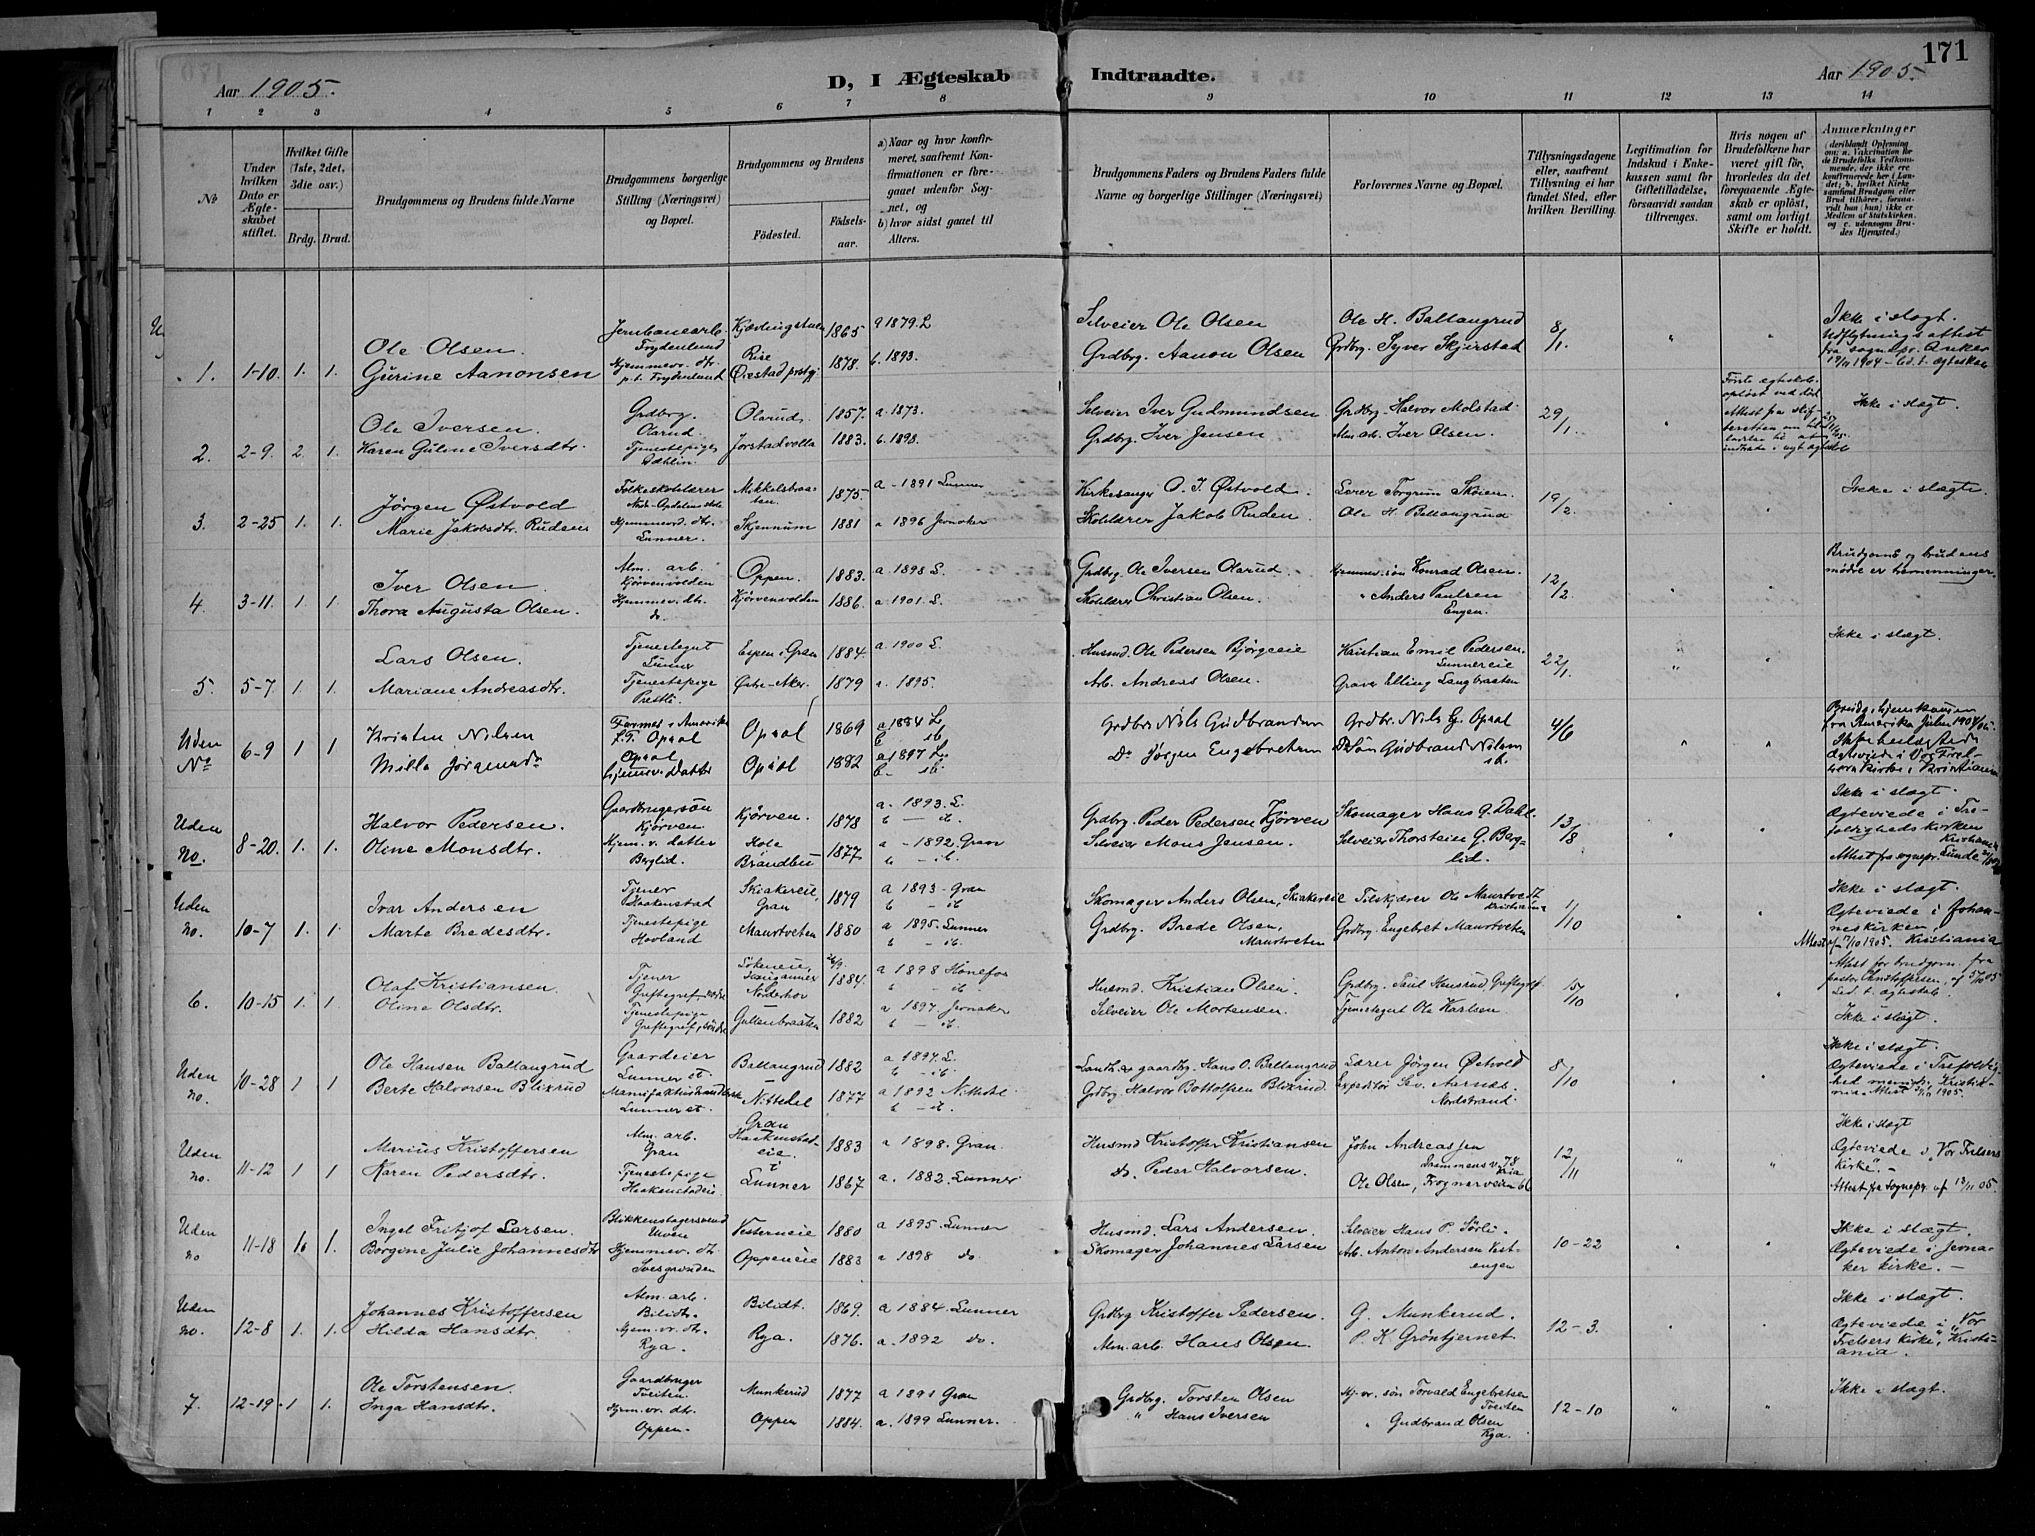 SAH, Jevnaker prestekontor, Ministerialbok nr. 10, 1891-1906, s. 171